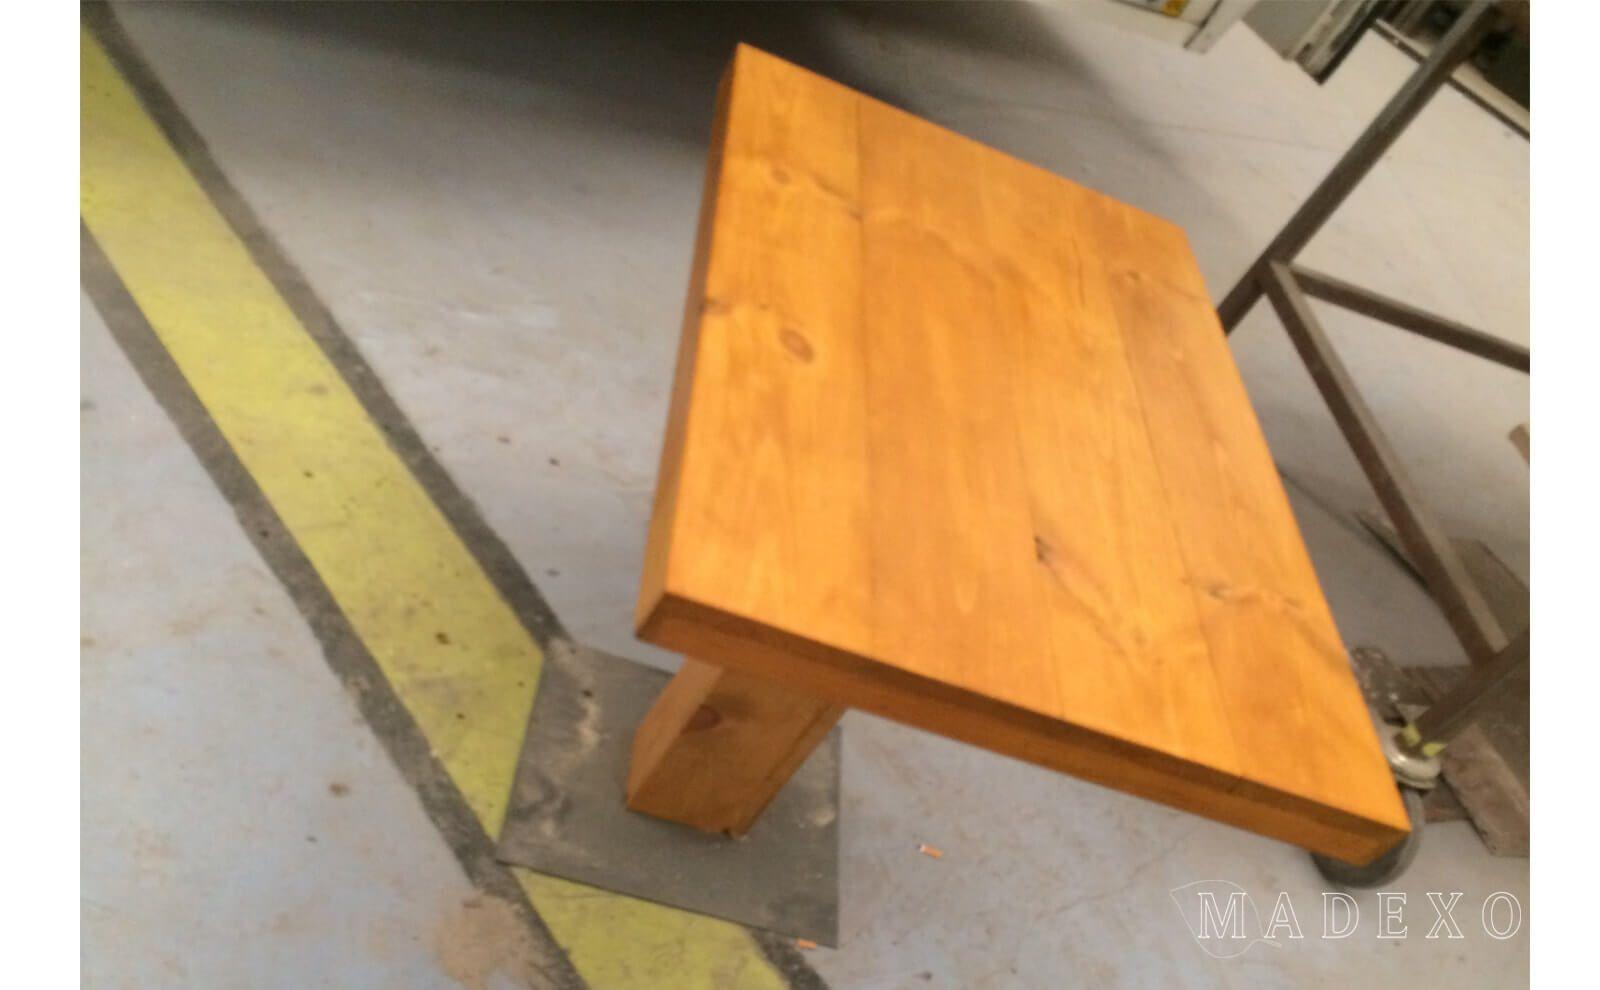 Madexo-Muebles-Rusticos-web-2